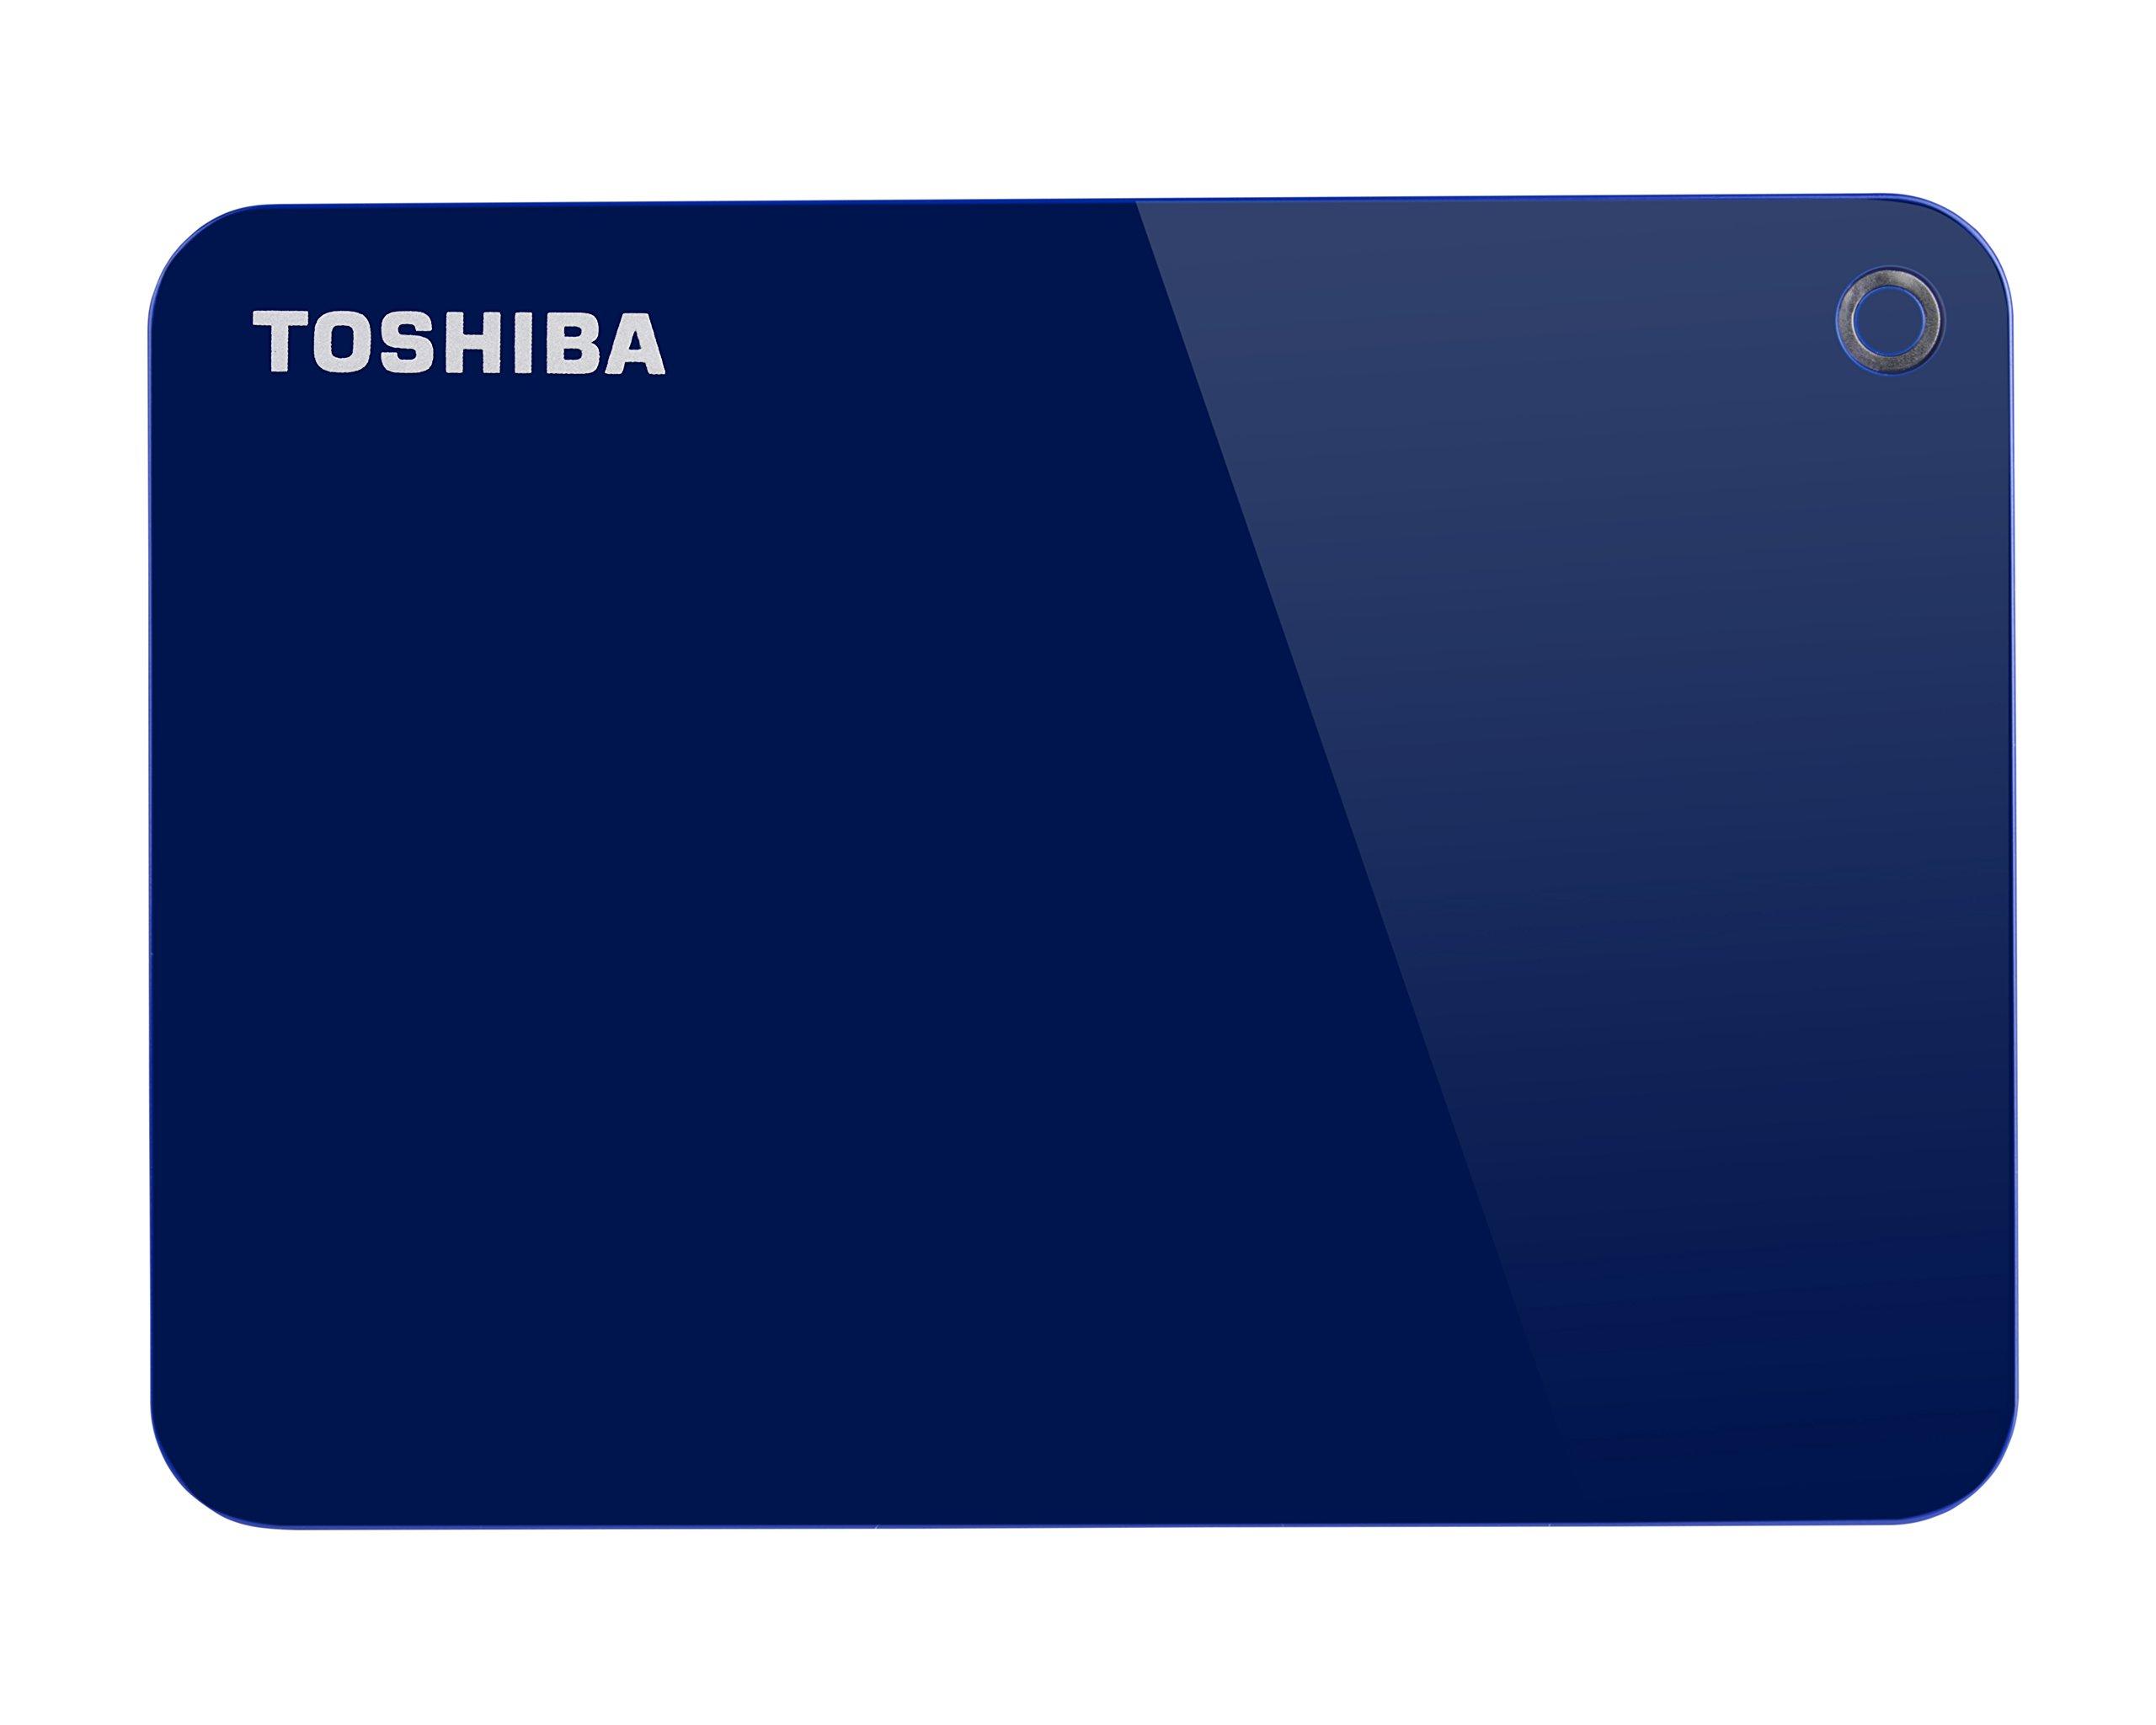 Toshiba Canvio Advance 4TB Portable External Hard Drive USB 3.0, Blue (HDTC940XL3CA) by Toshiba (Image #2)